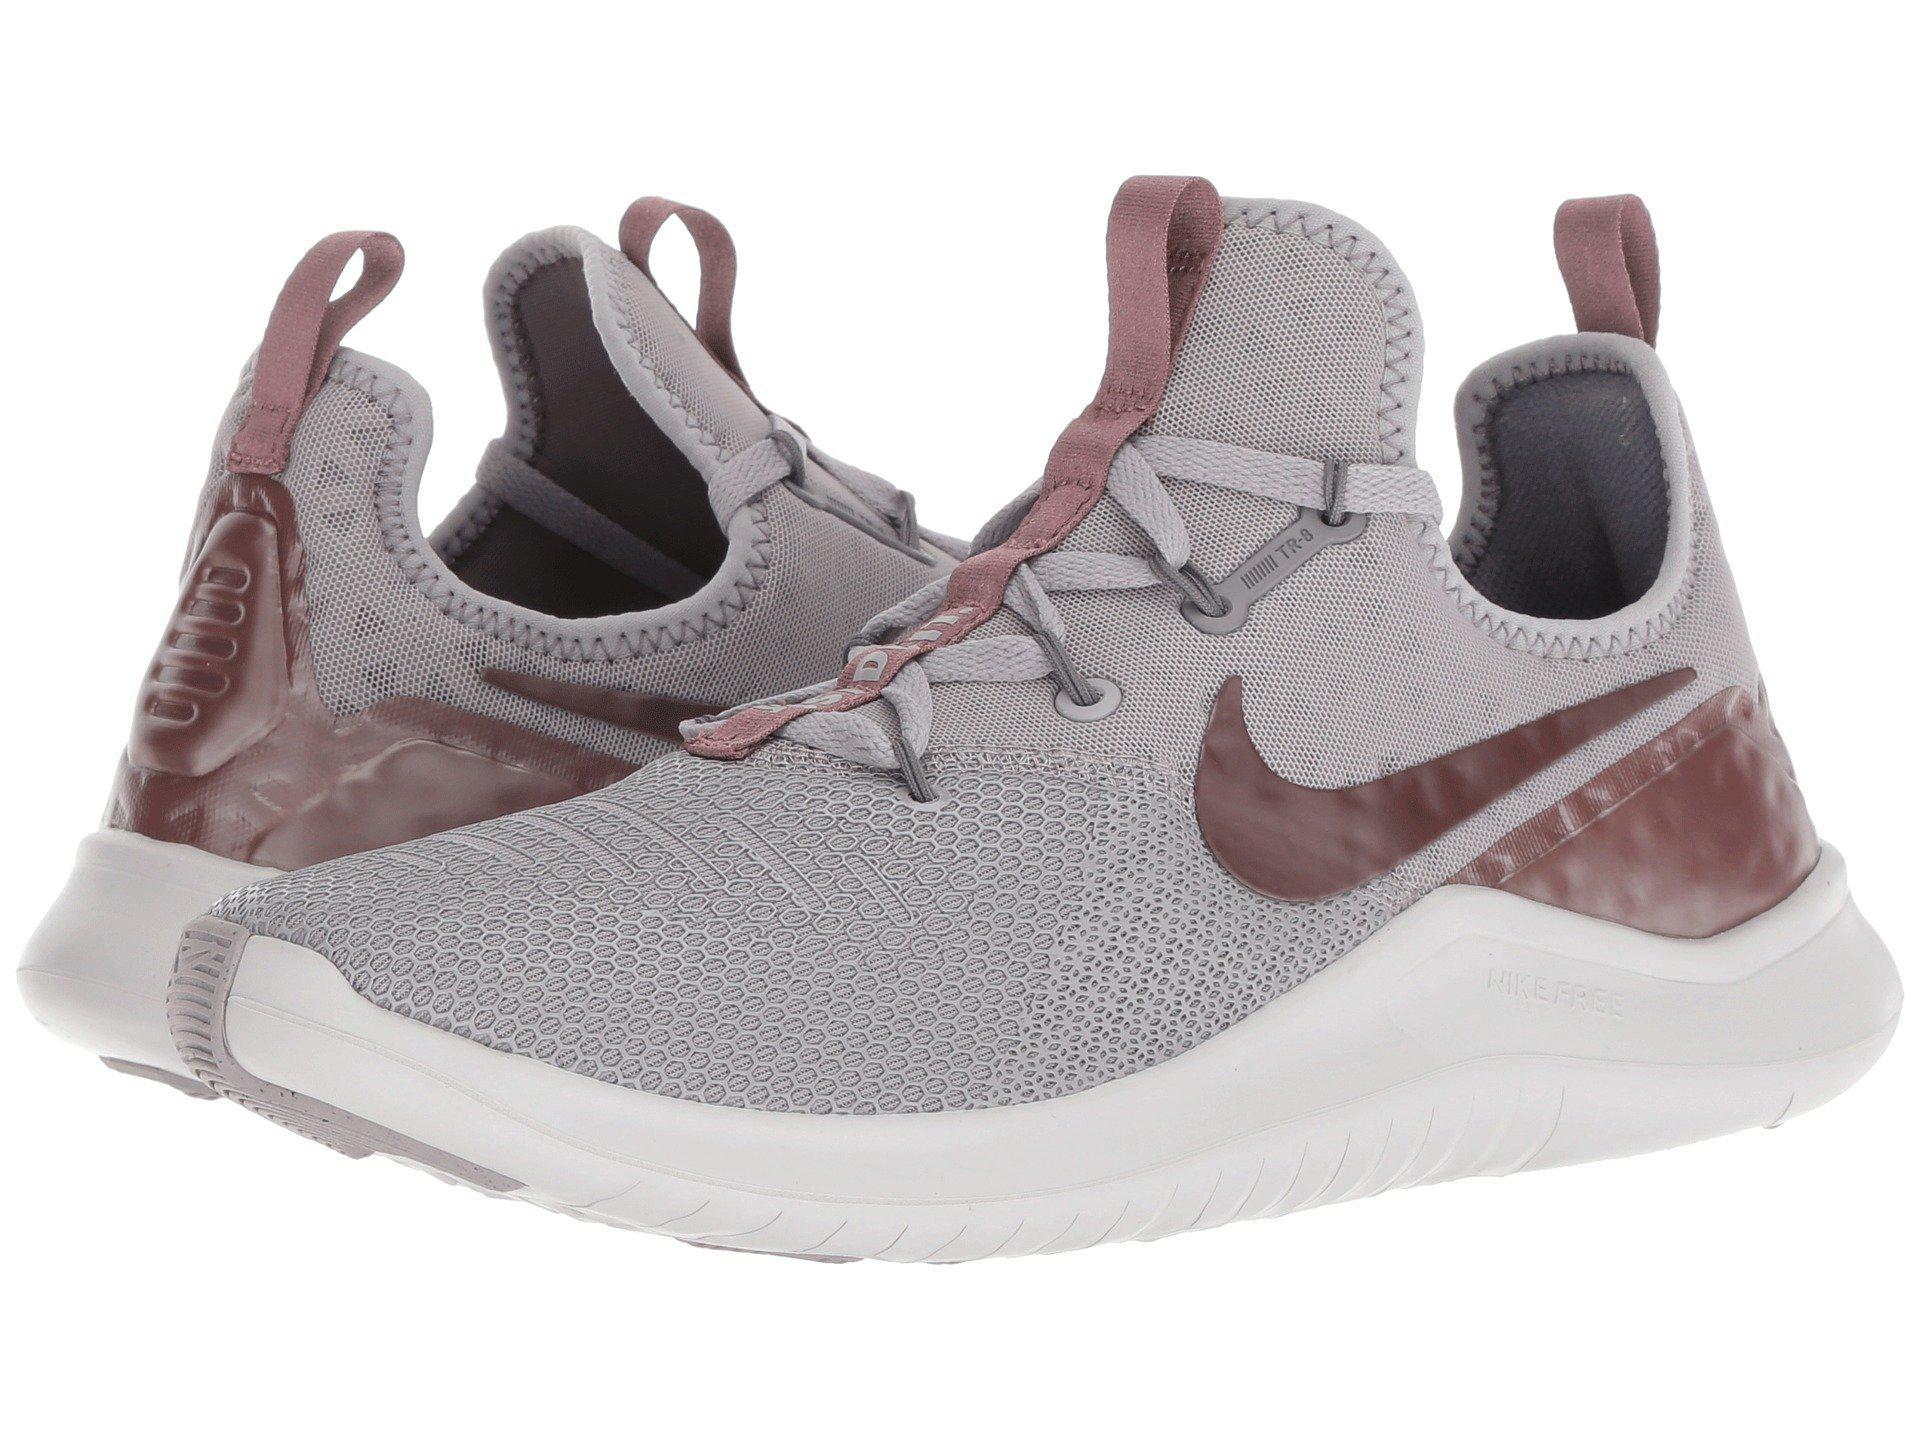 9cc6a9eb8c8 Lyst - Nike Free Tr 8 Lm in Gray